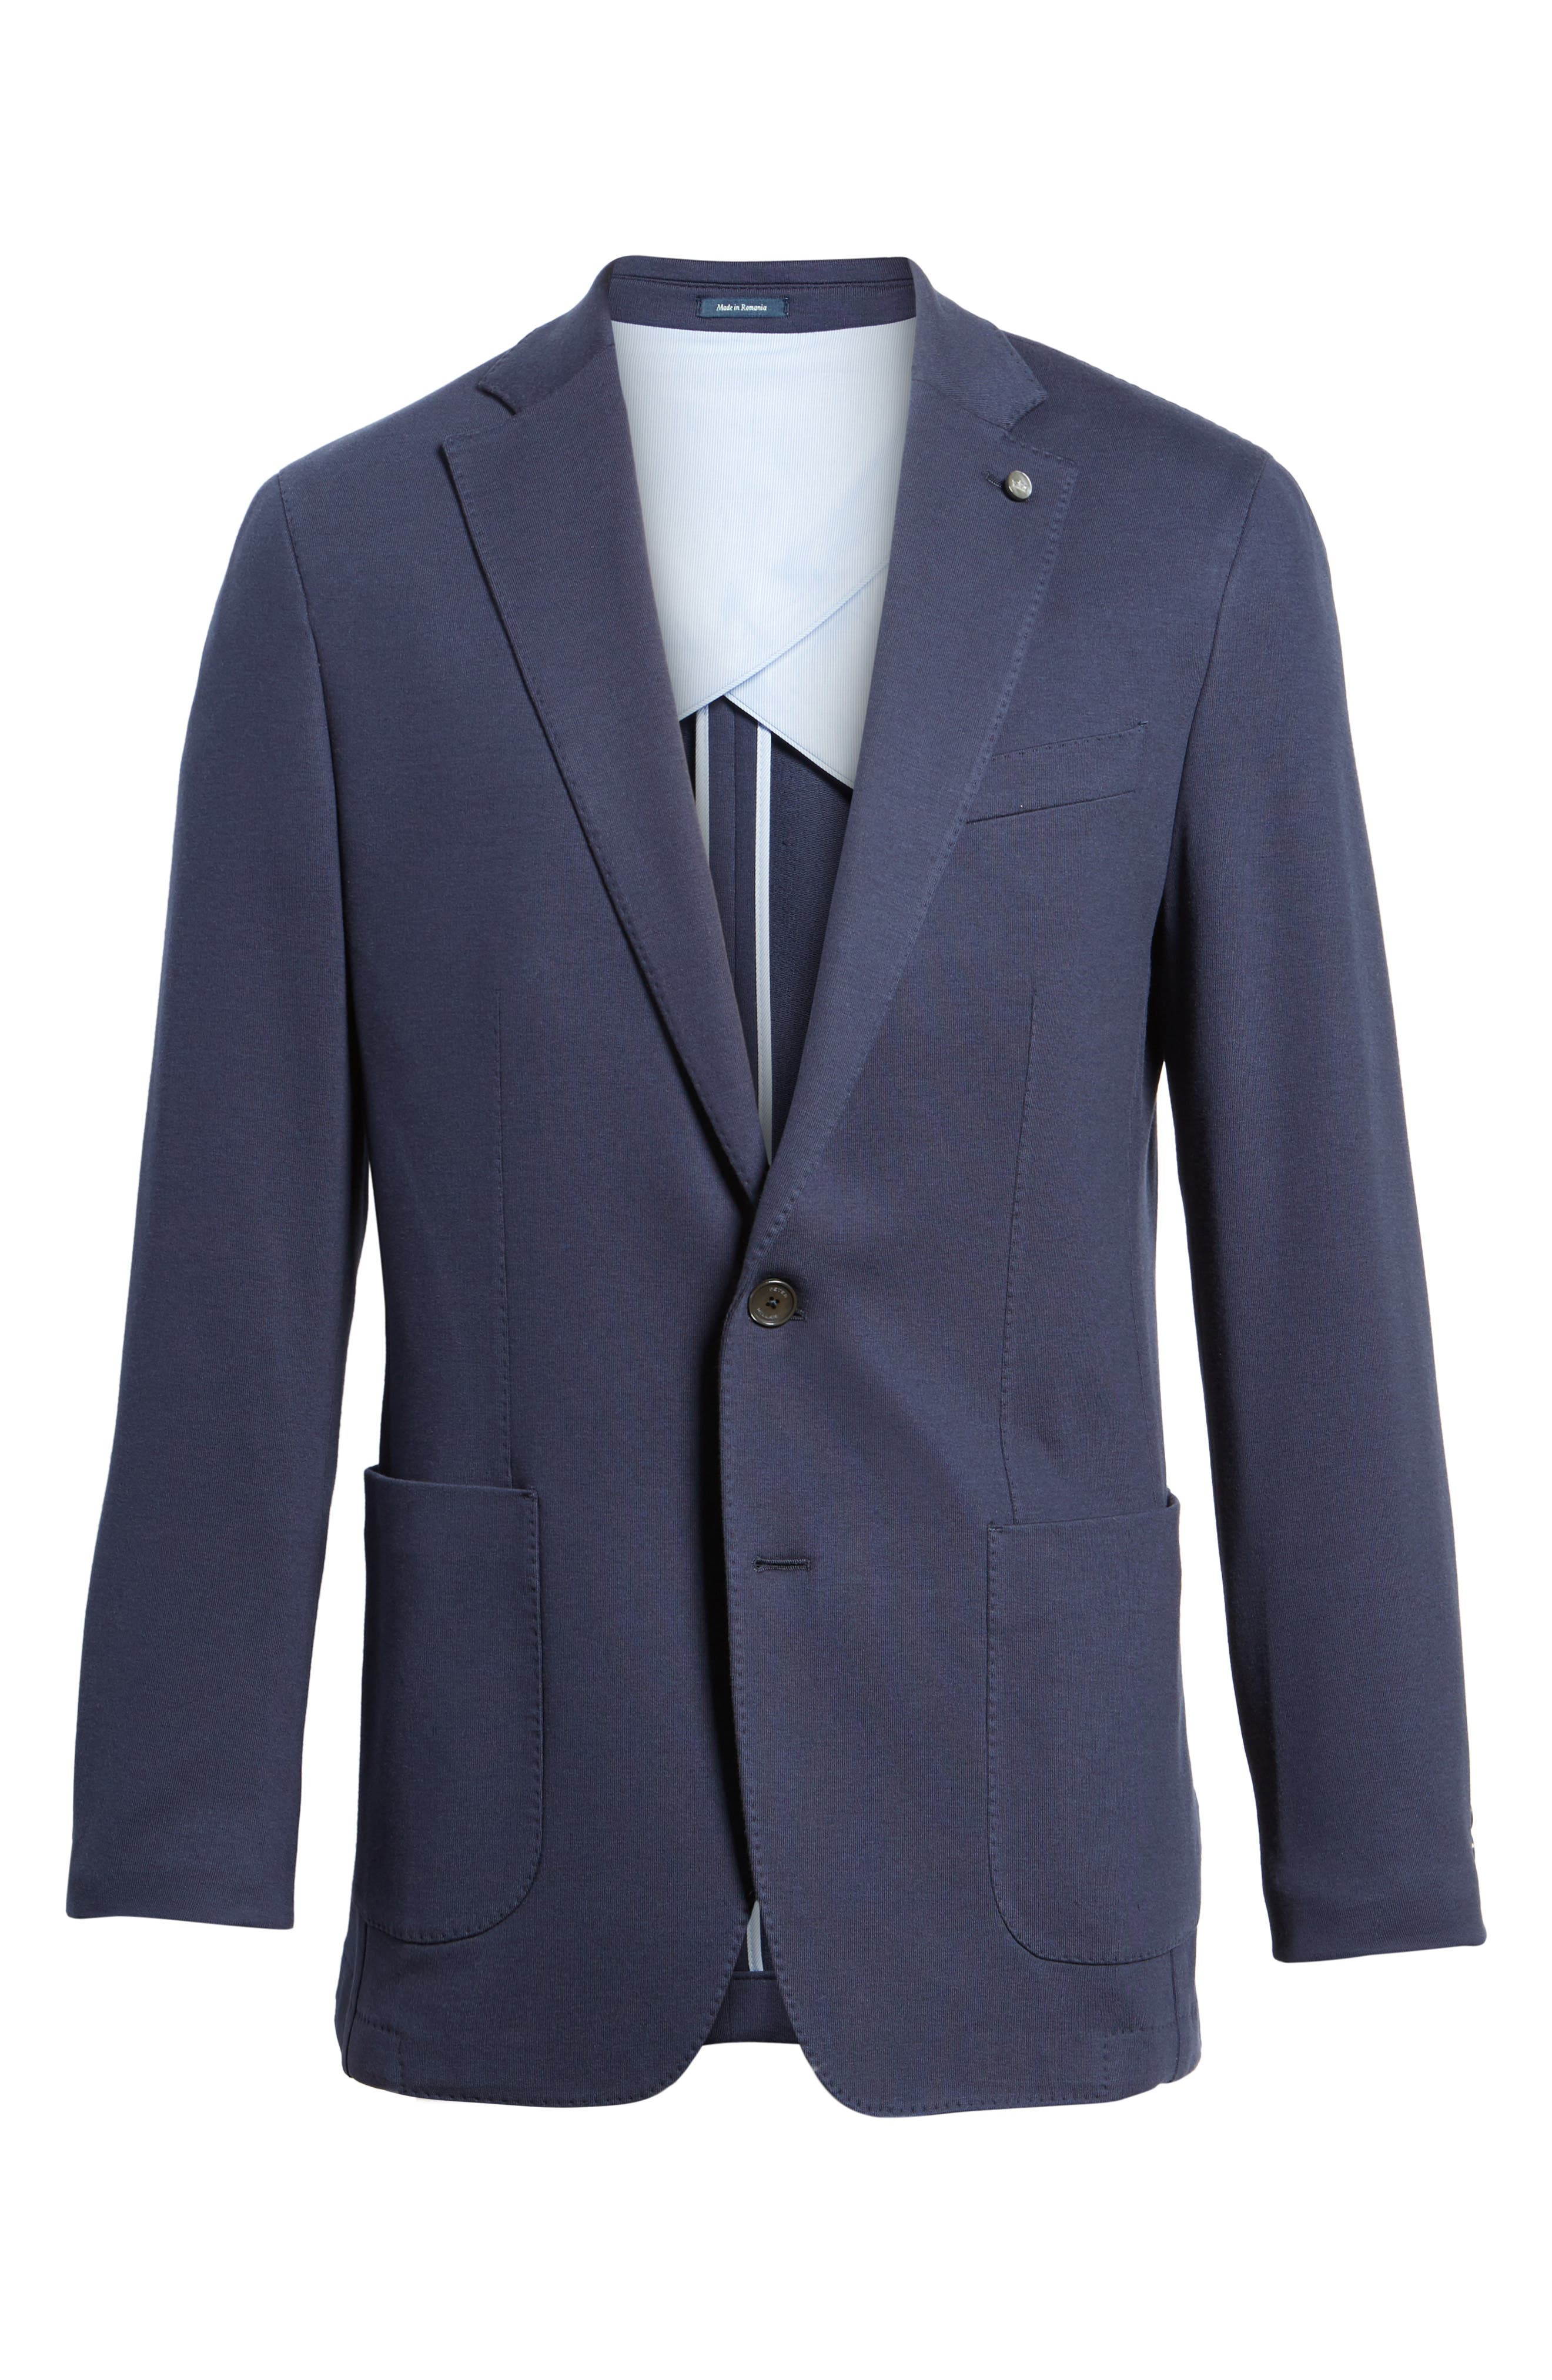 Santorini Jersey Knit Jacket,                             Alternate thumbnail 5, color,                             417